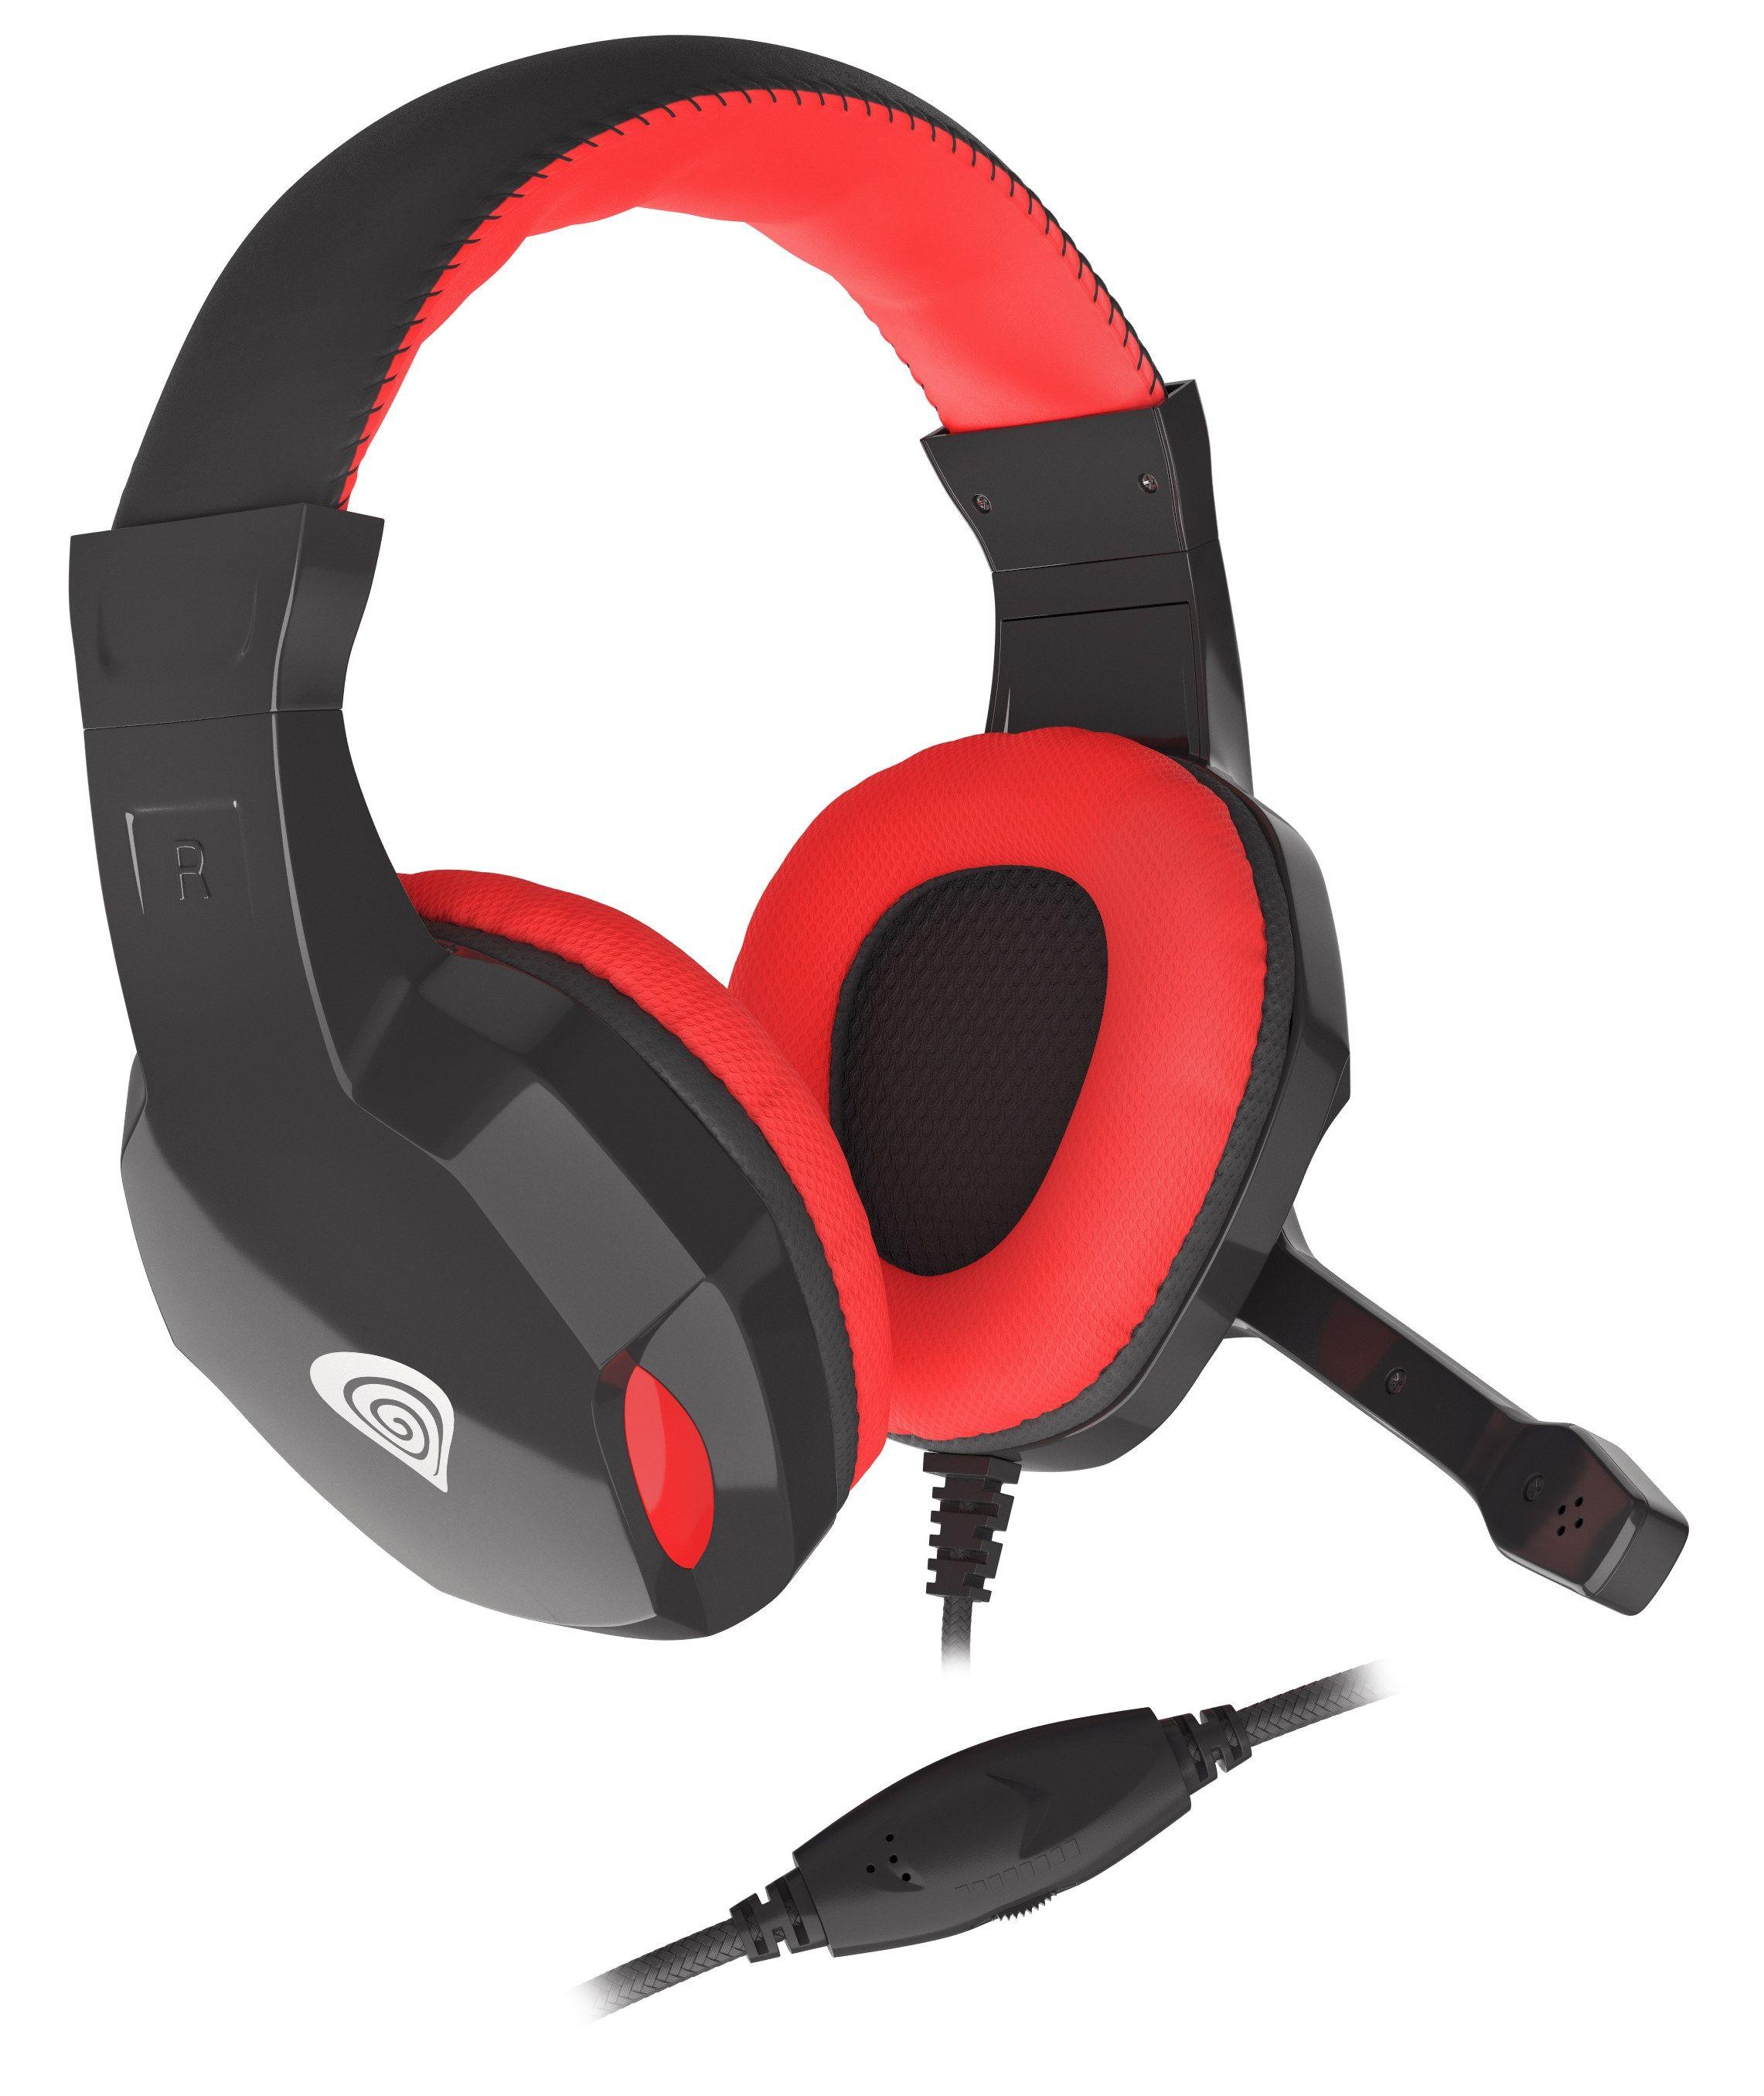 Гейминг слушалки Genesis - Argon 110, черни - 3